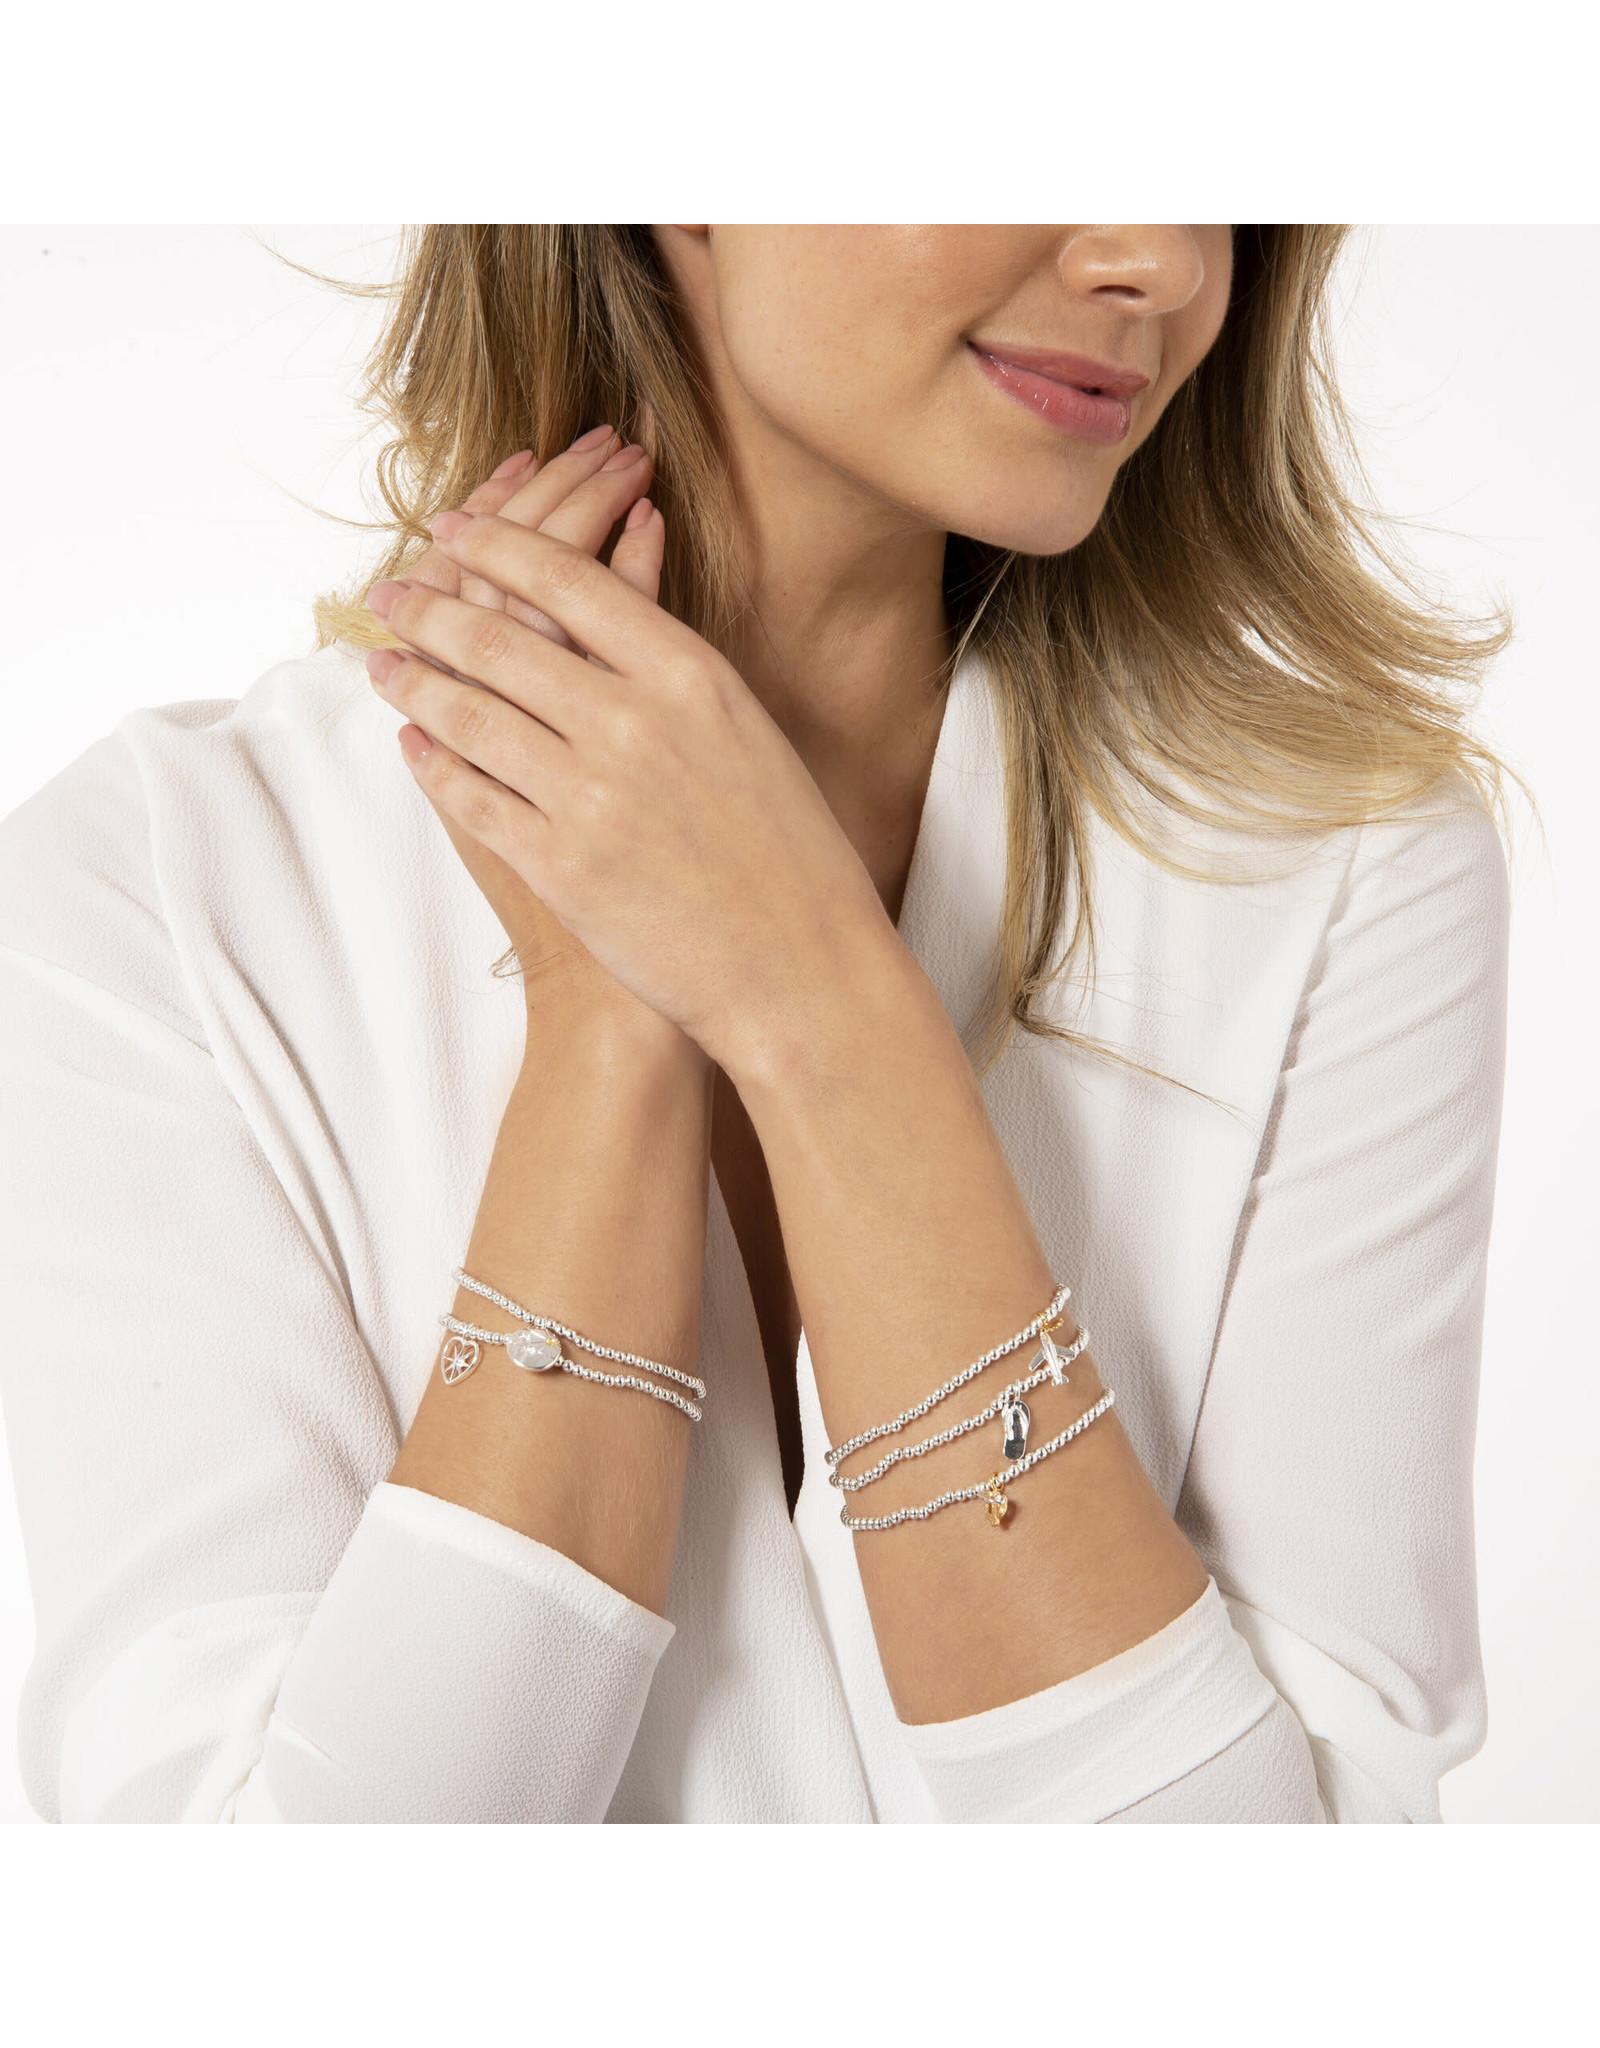 Joma Jewellery A Little - Adventure Awaits - Armband